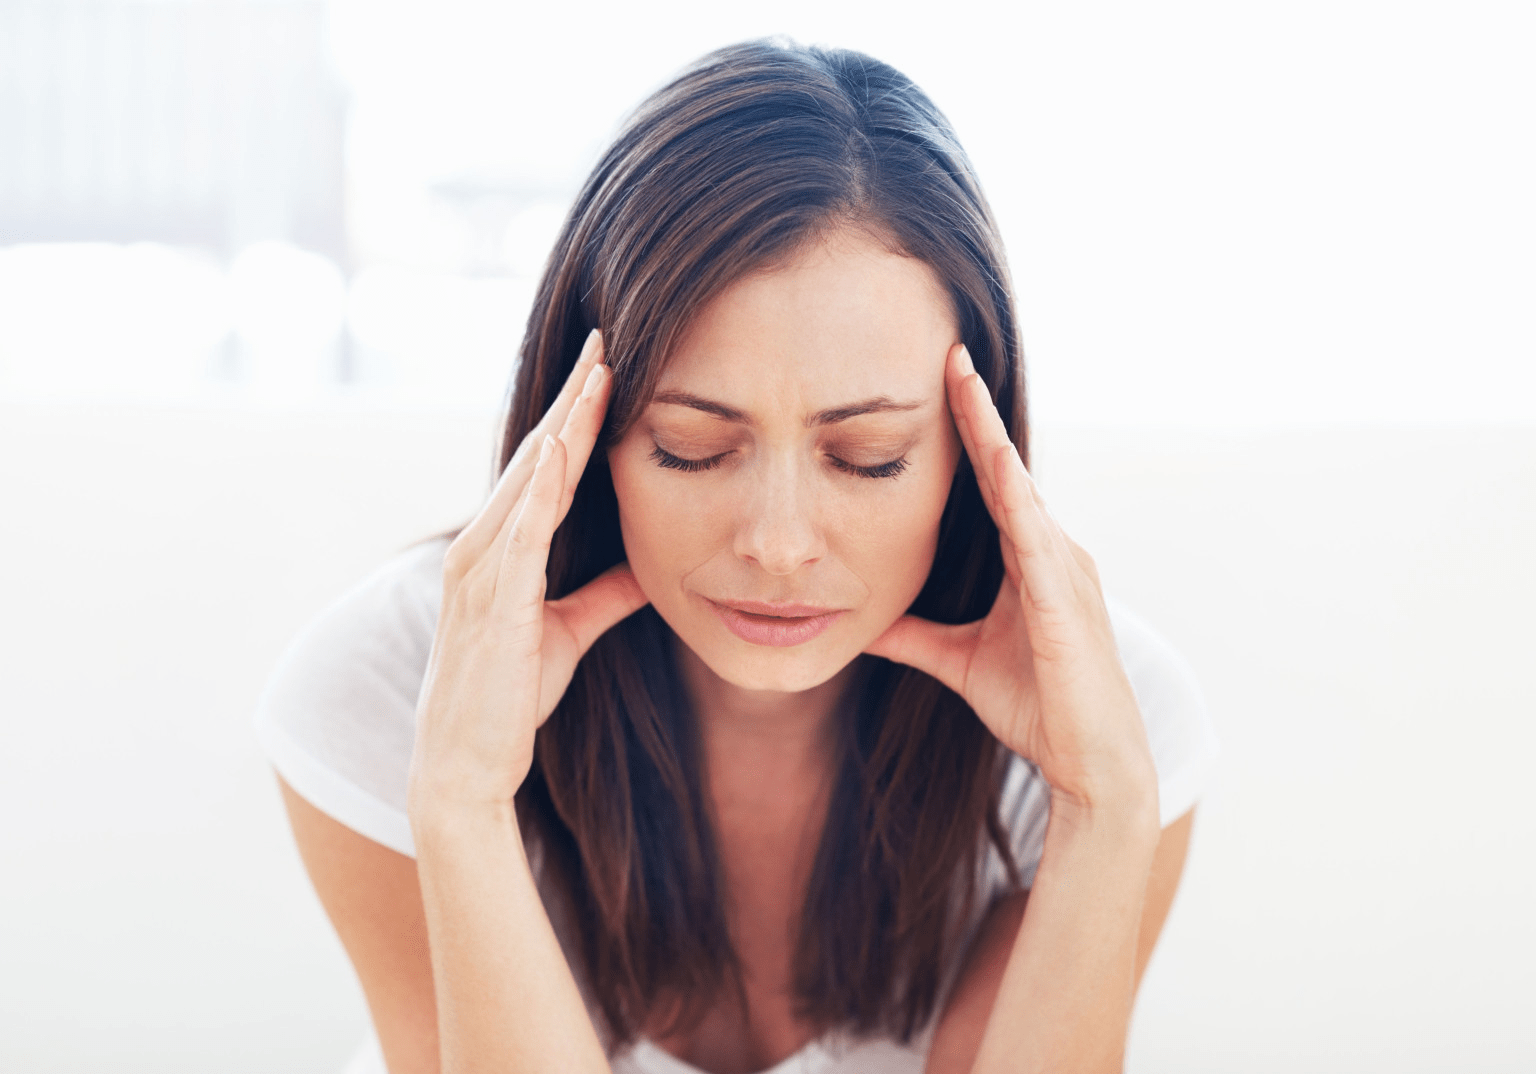 Carenza di magnesio: sintomi, cause e rimedi